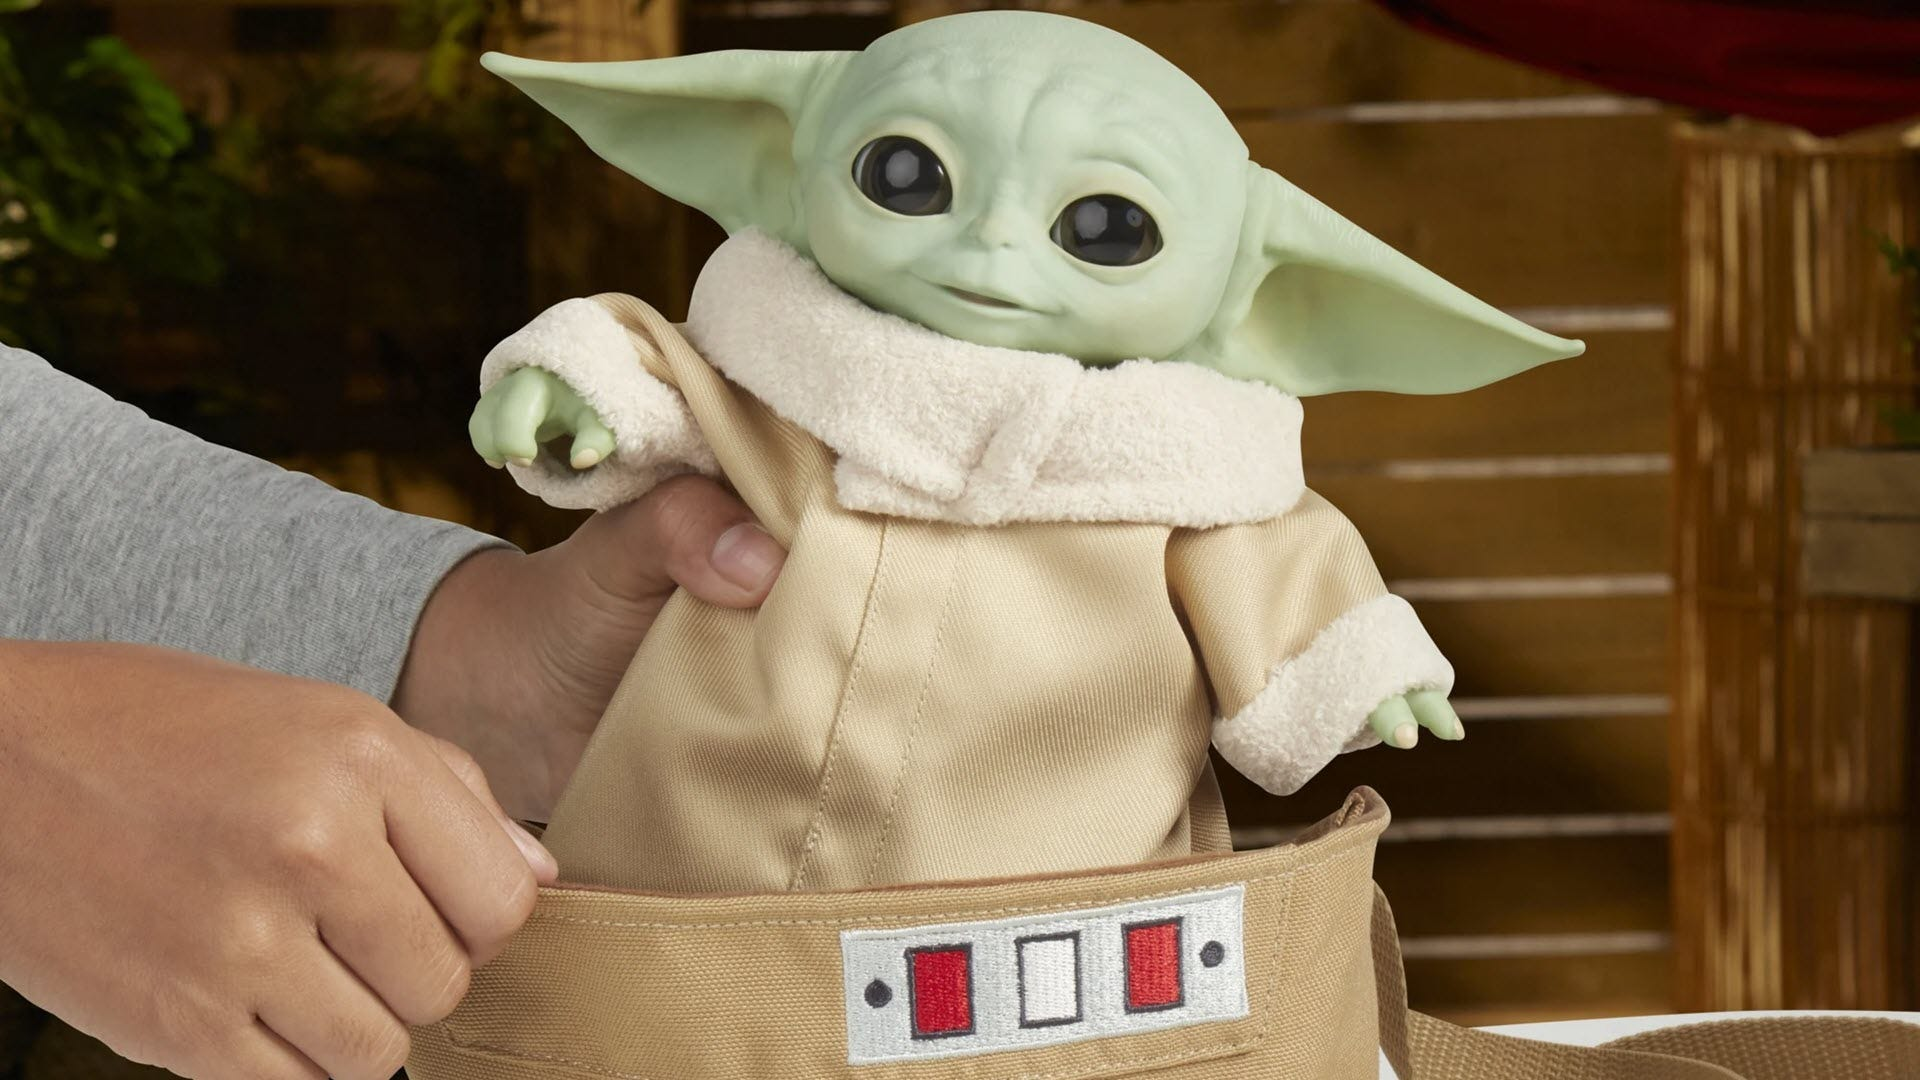 An Animatronic Baby Yoda in a cloth carrying bag.